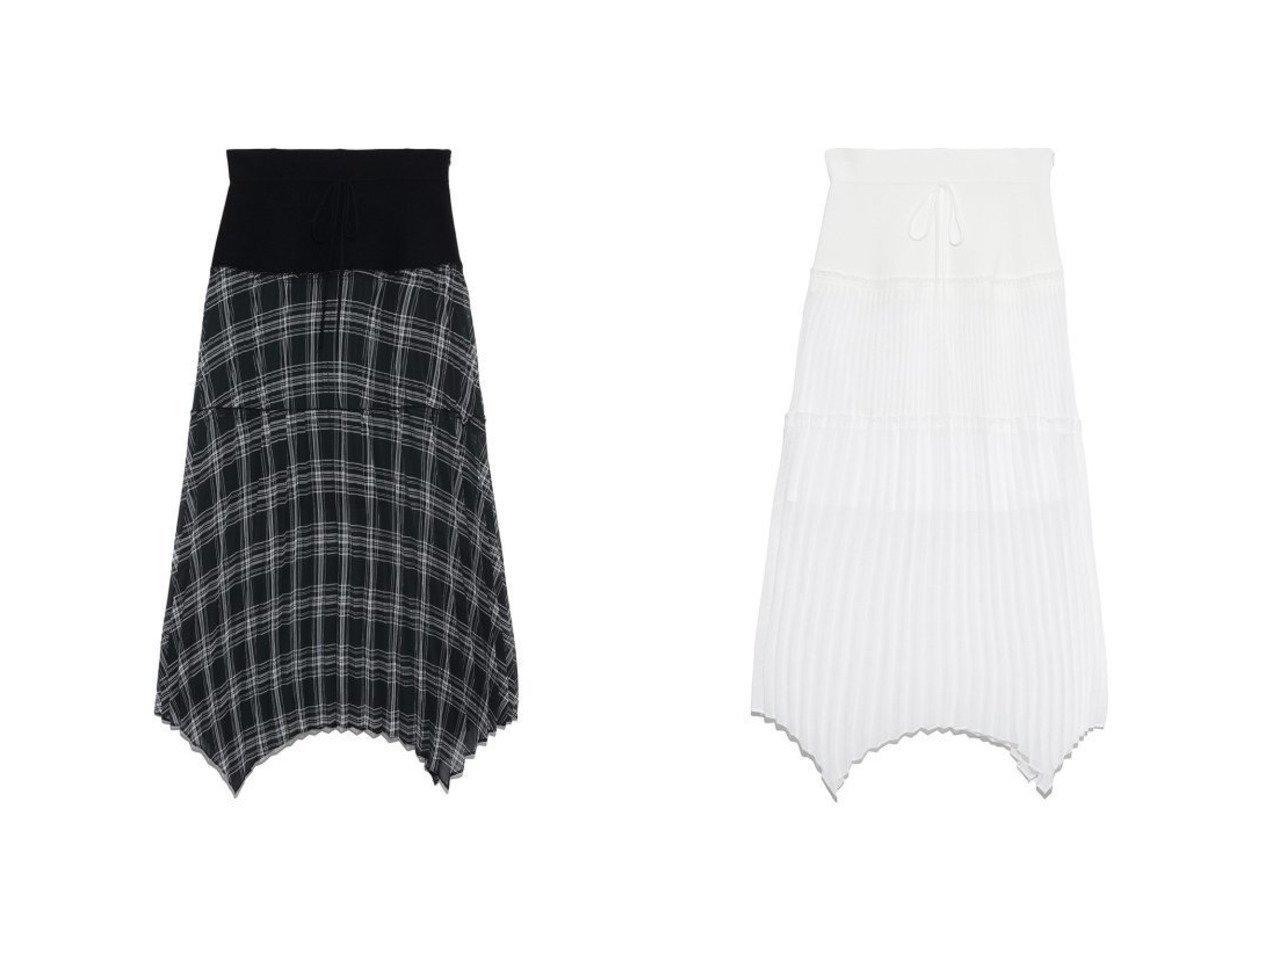 【FURFUR/ファーファー】のシアーチェックコンビスカート スカートのおすすめ!人気、トレンド・レディースファッションの通販 おすすめで人気の流行・トレンド、ファッションの通販商品 メンズファッション・キッズファッション・インテリア・家具・レディースファッション・服の通販 founy(ファニー) https://founy.com/ ファッション Fashion レディースファッション WOMEN スカート Skirt スウェット スマート セットアップ セーター プリーツ 再入荷 Restock/Back in Stock/Re Arrival |ID:crp329100000016089